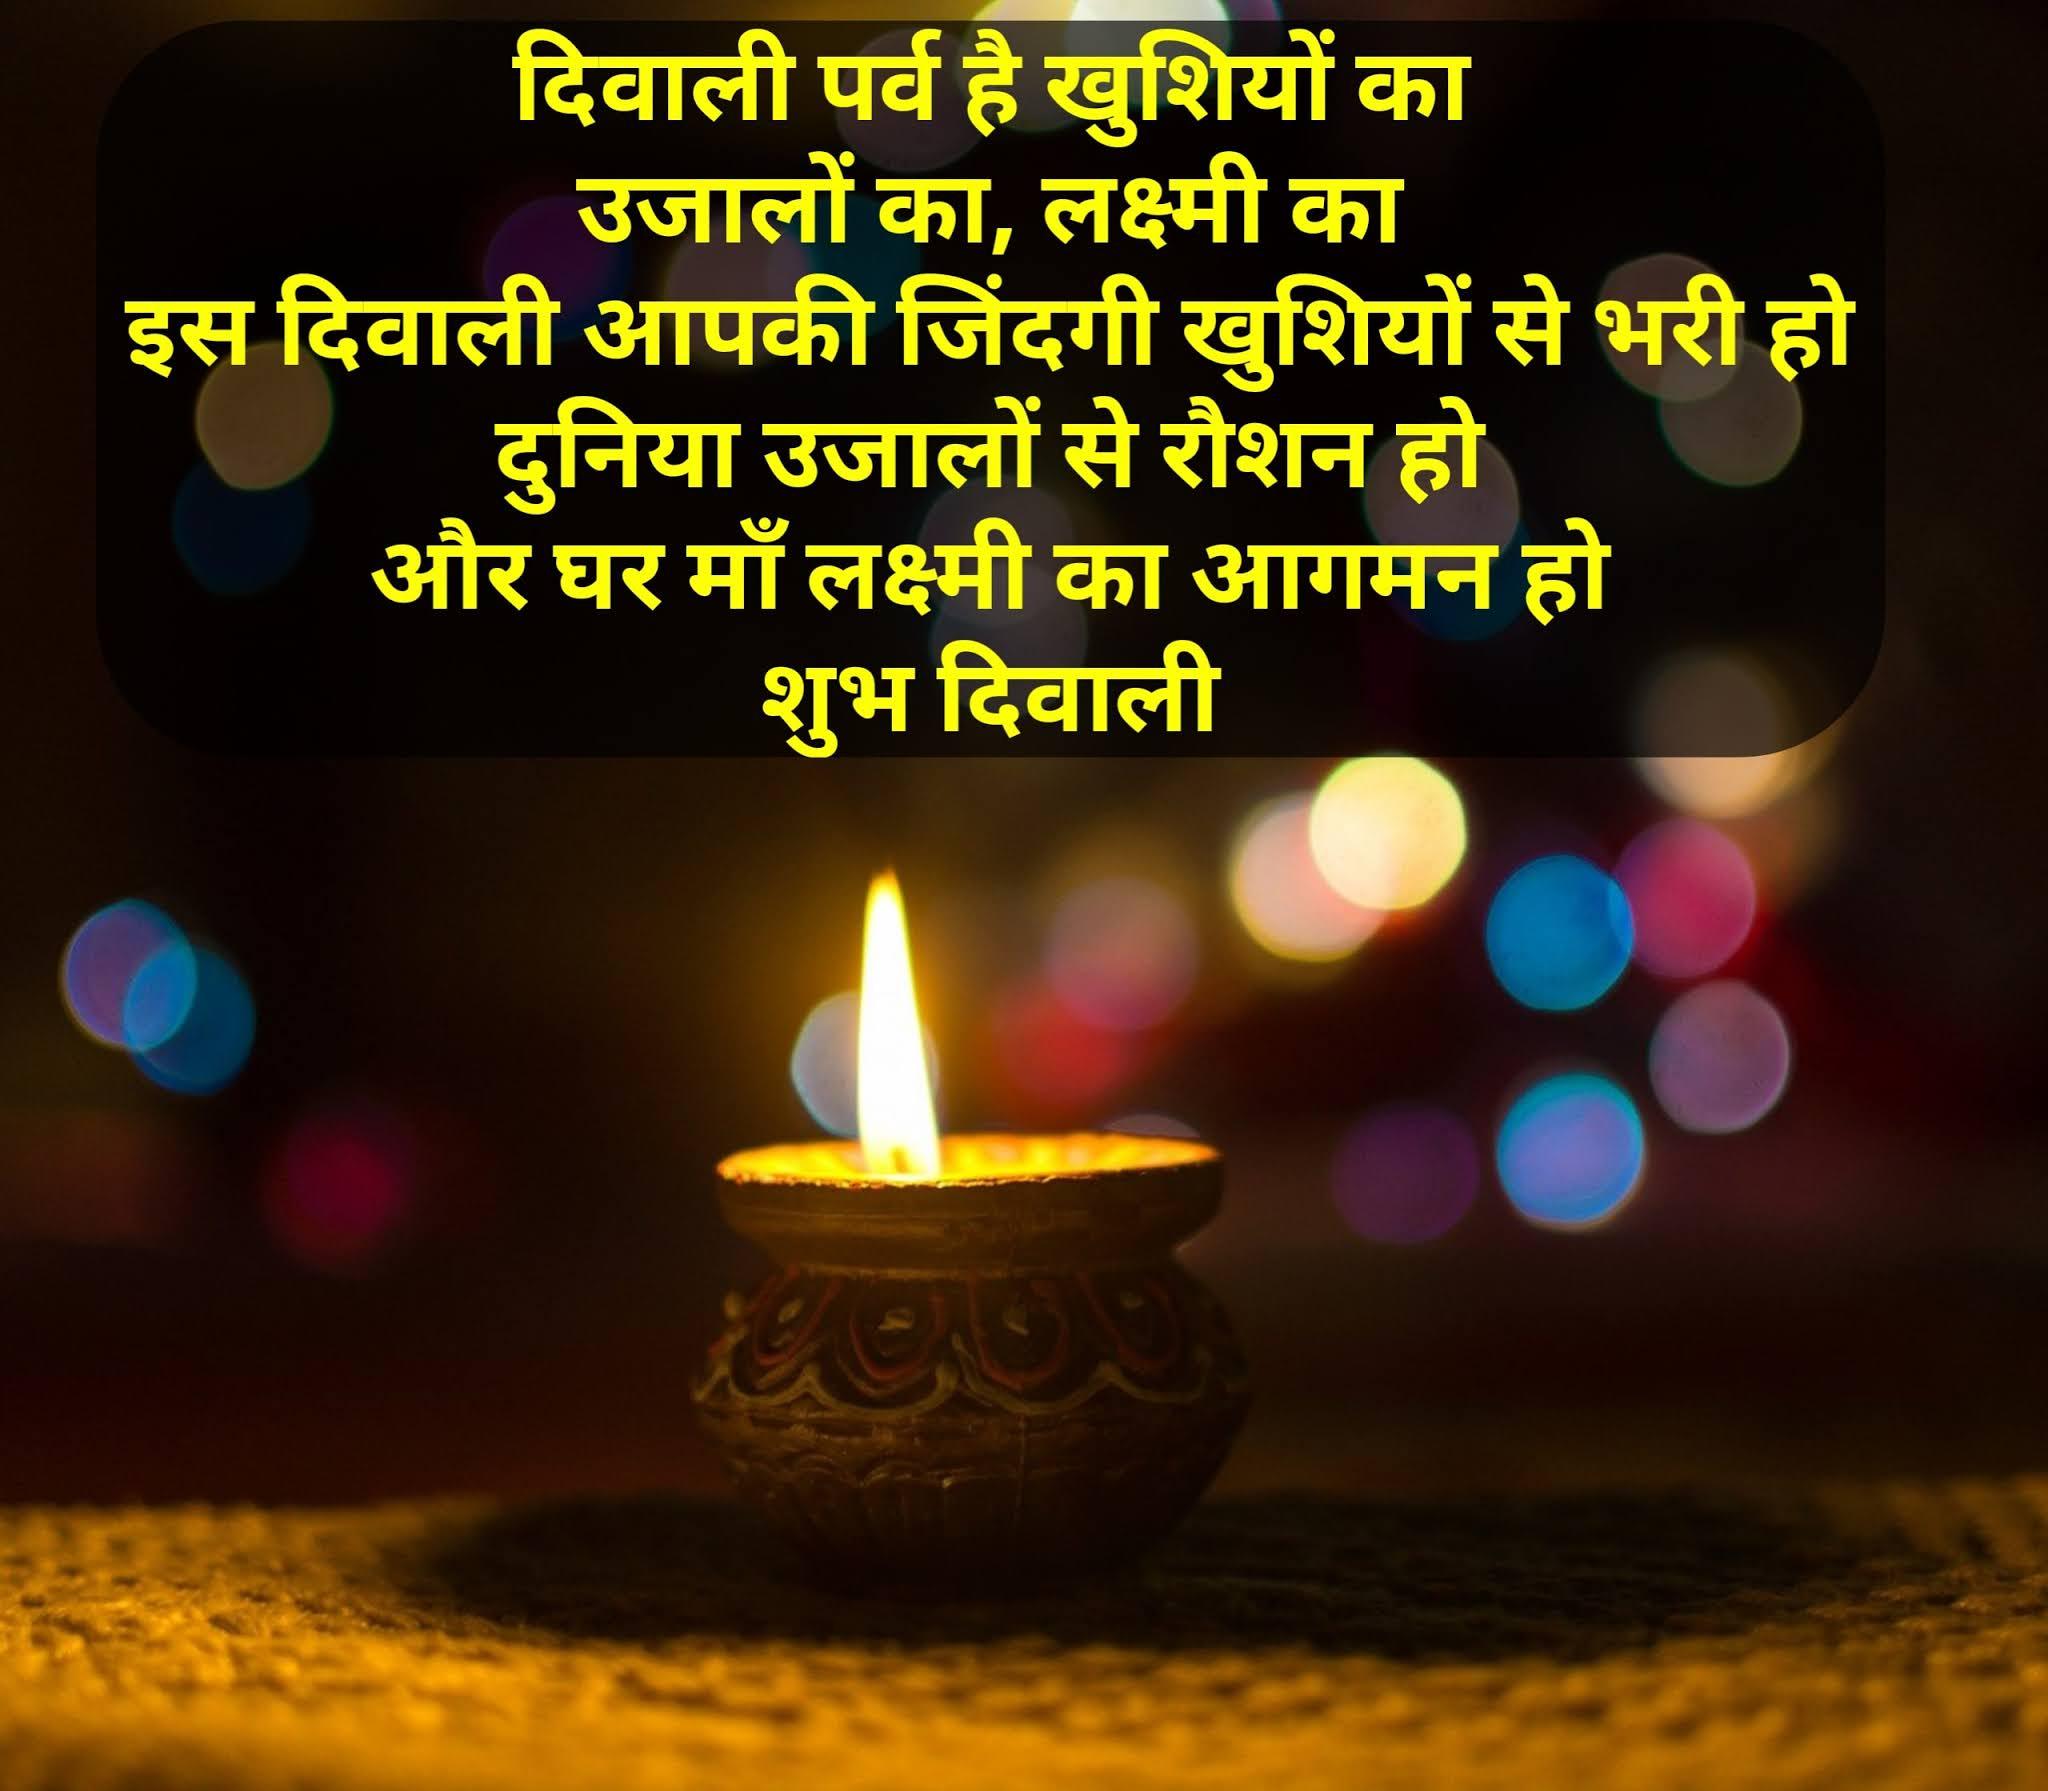 Diwali good wishes